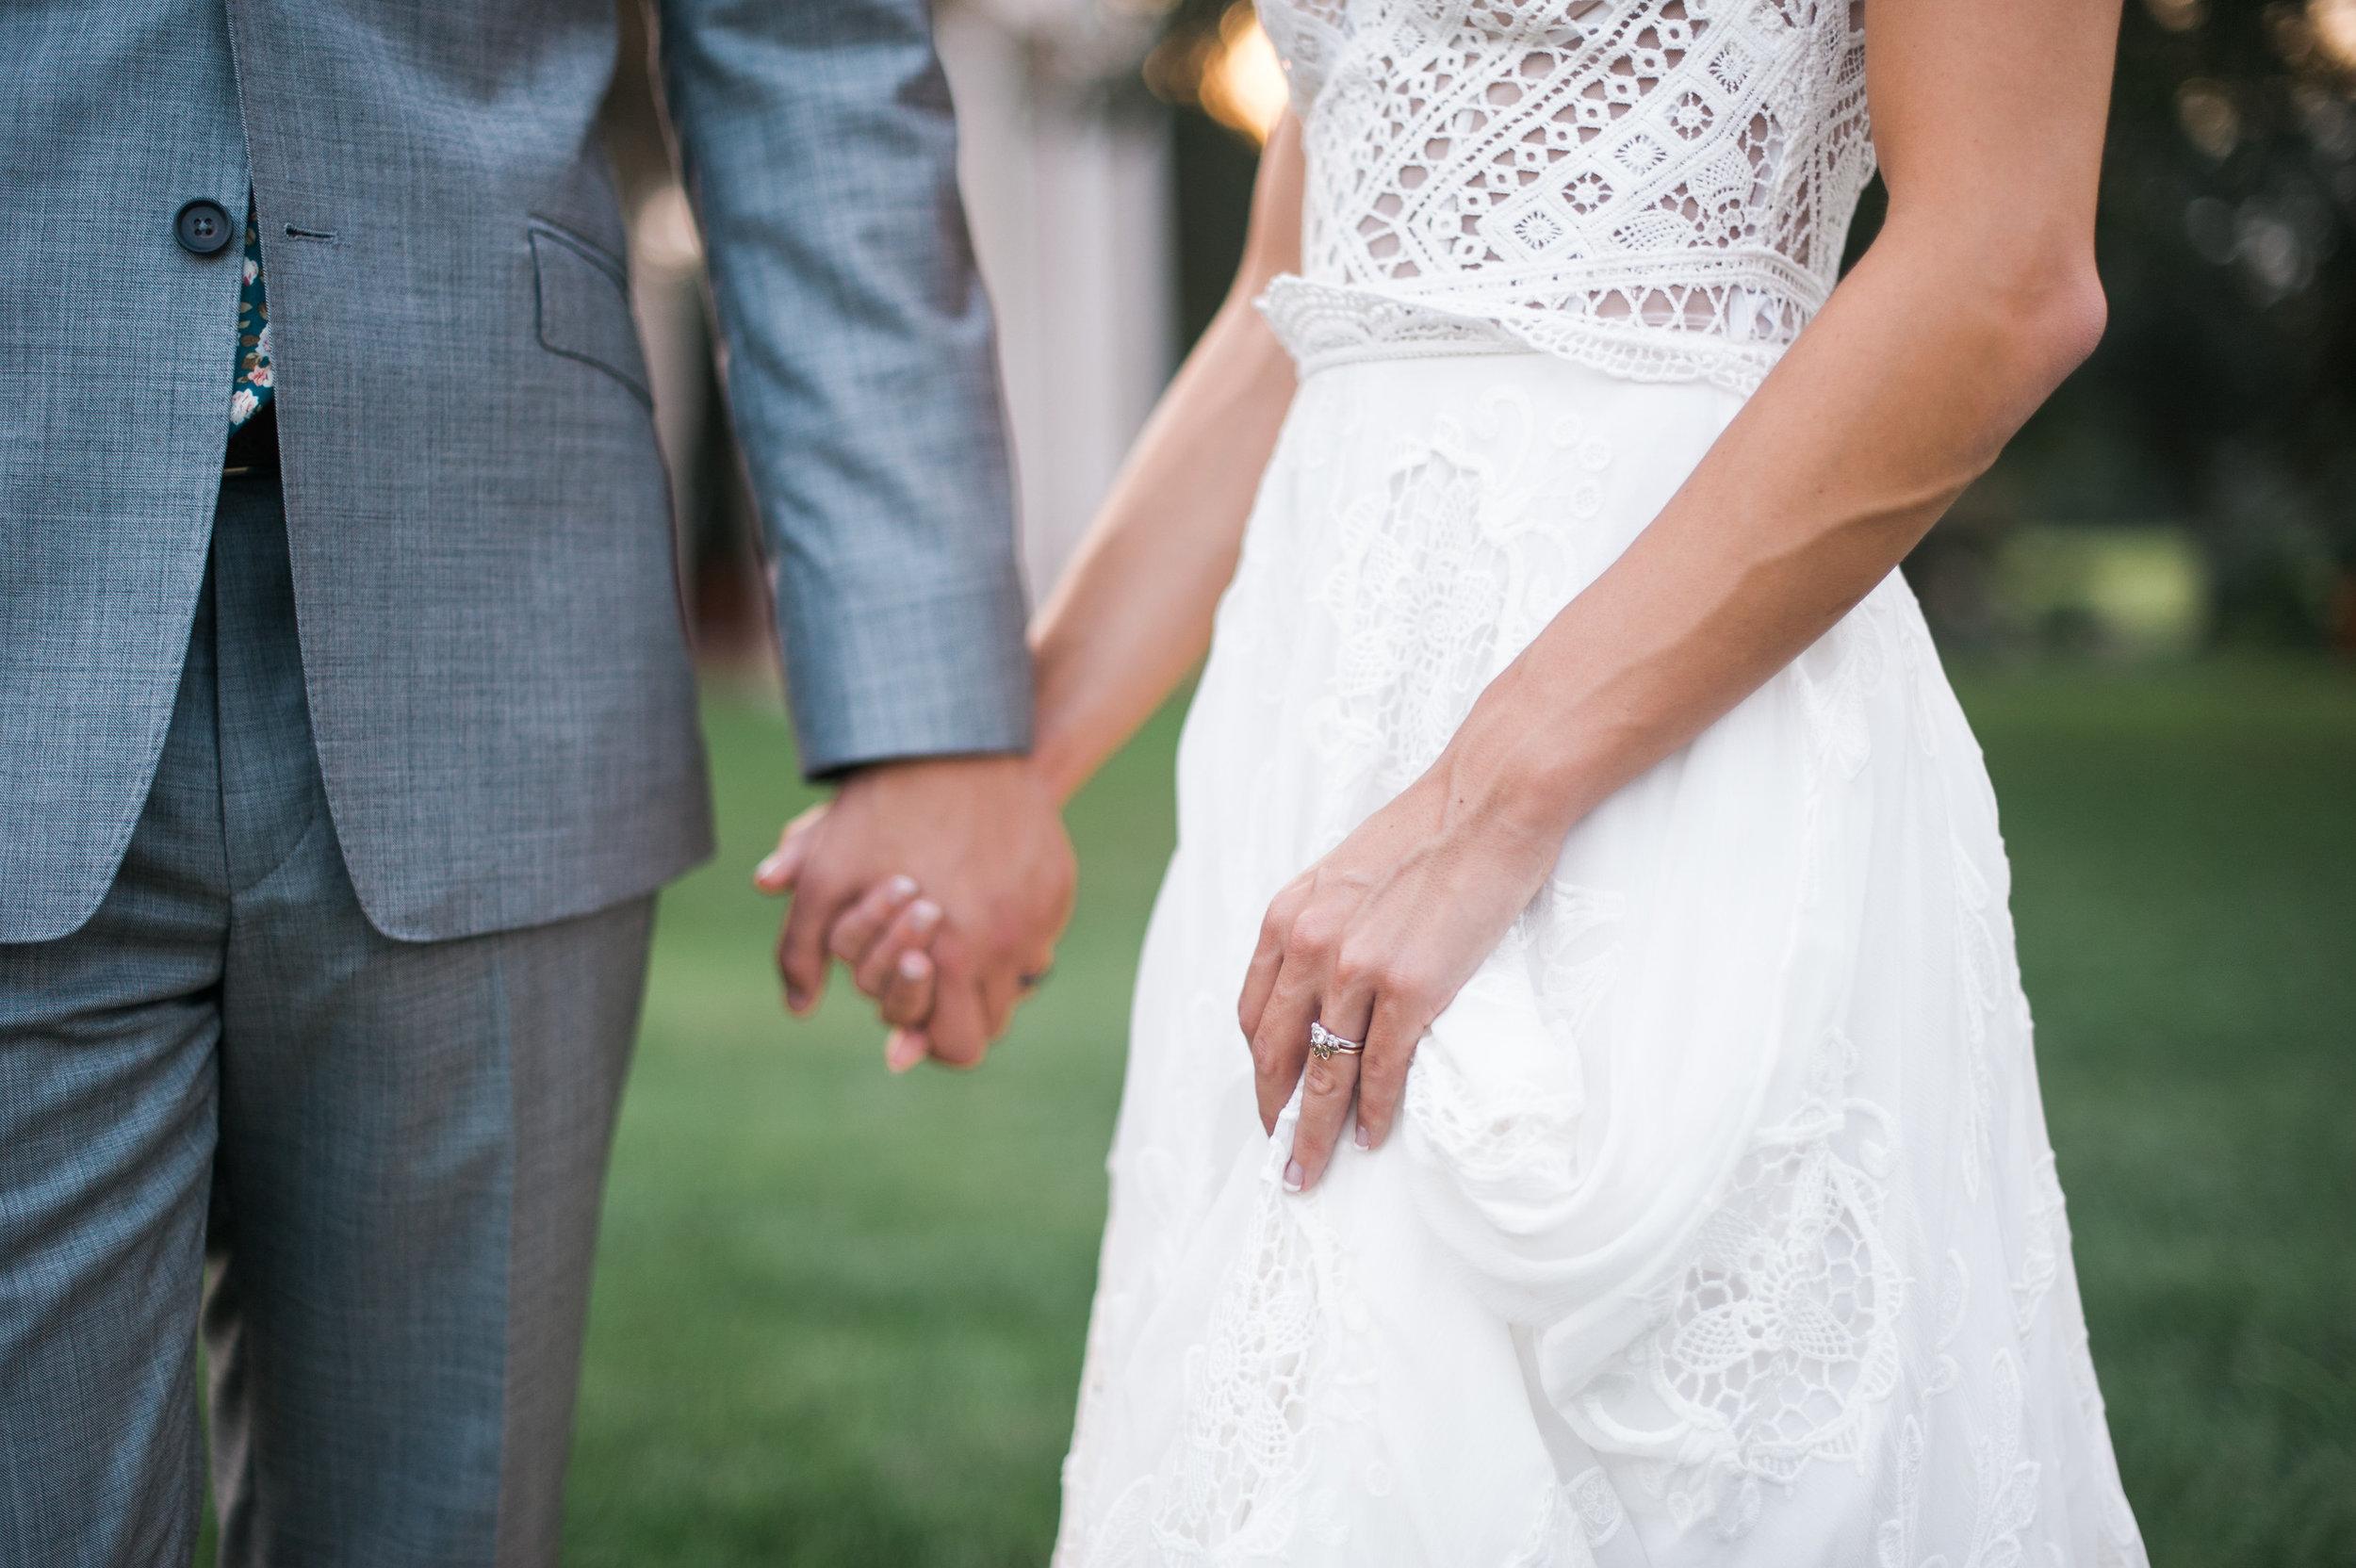 thomas-wedding-353-X5.jpg